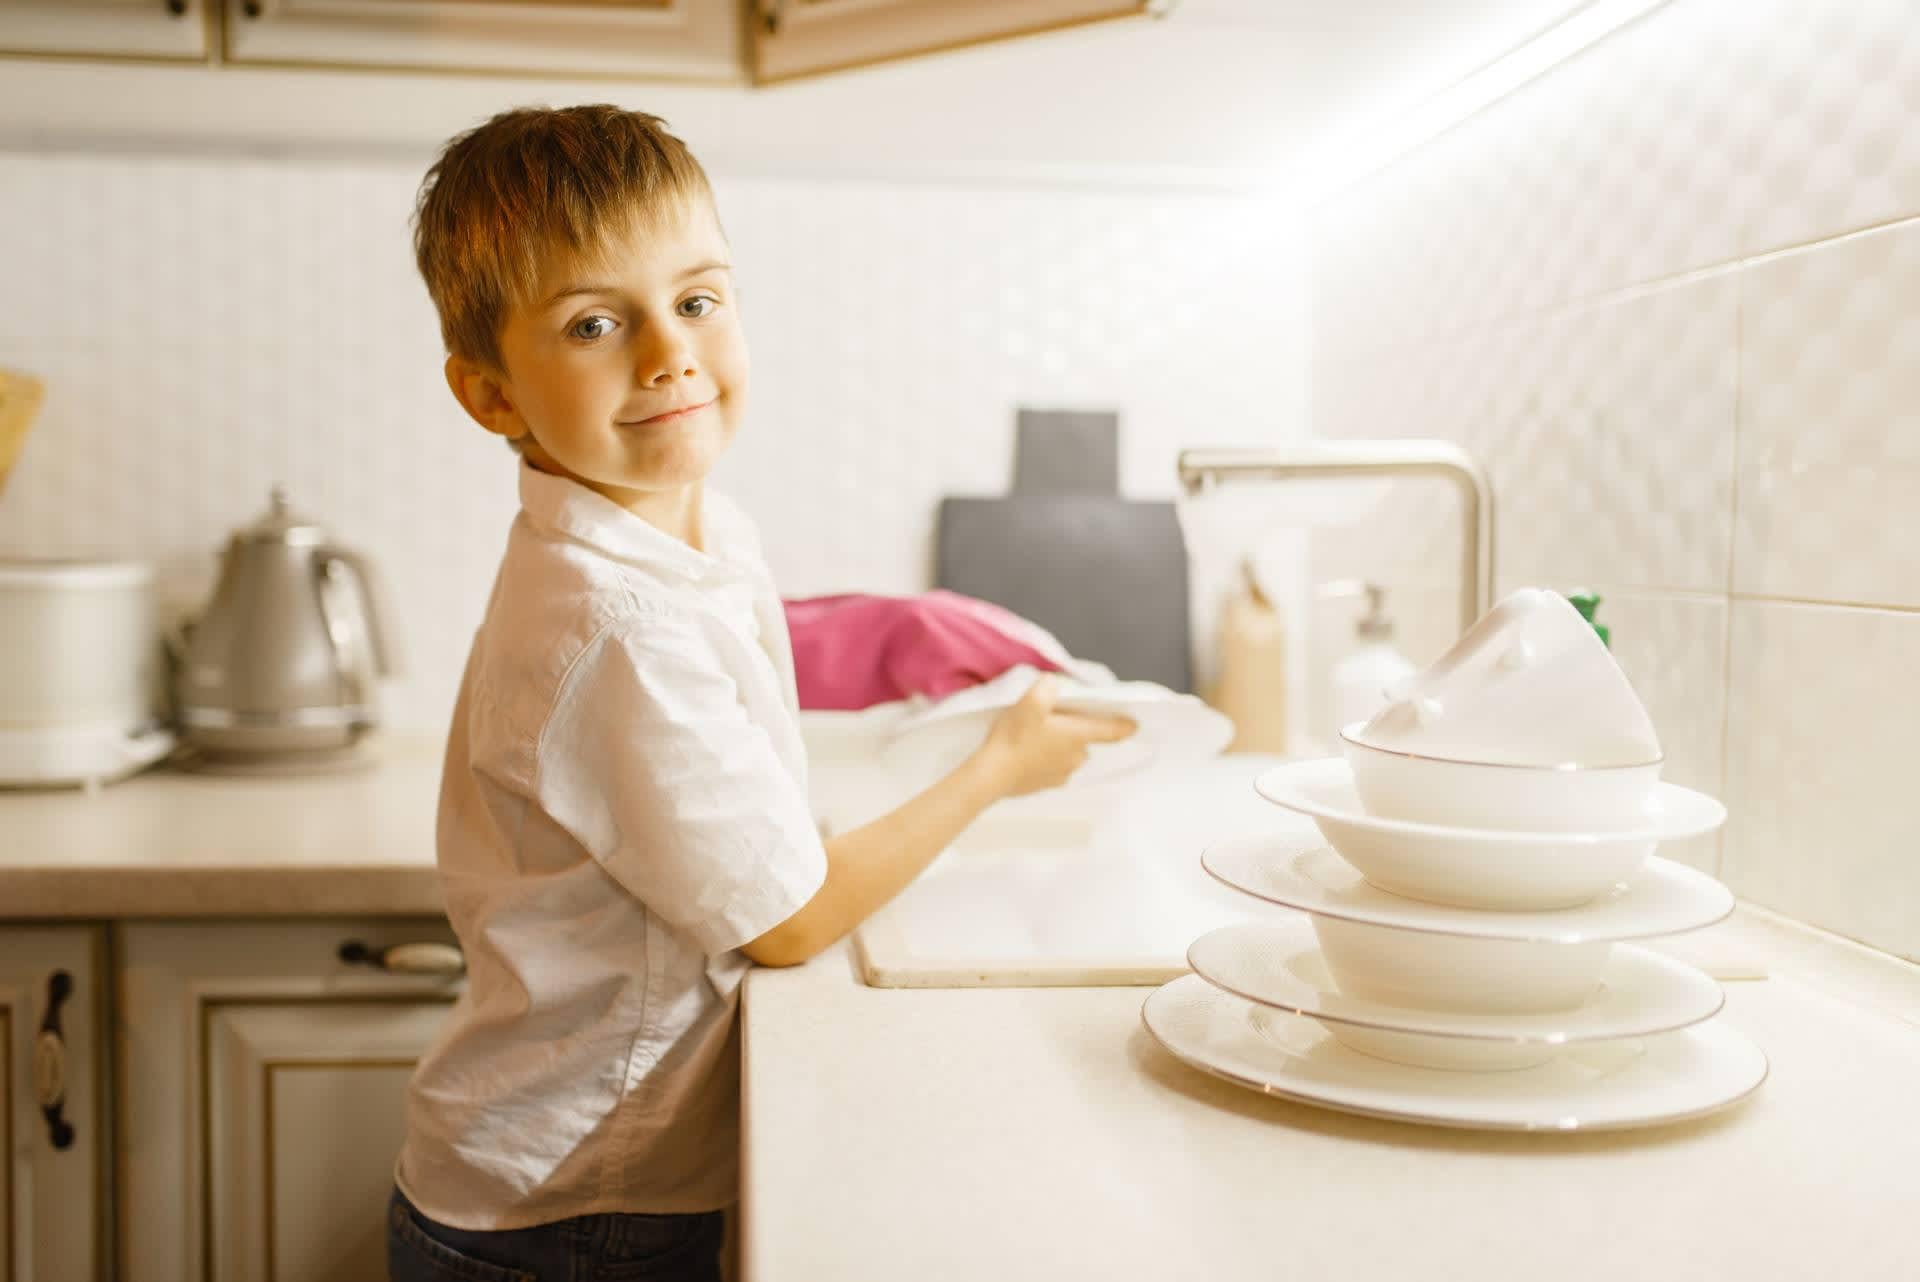 уборке в кухне